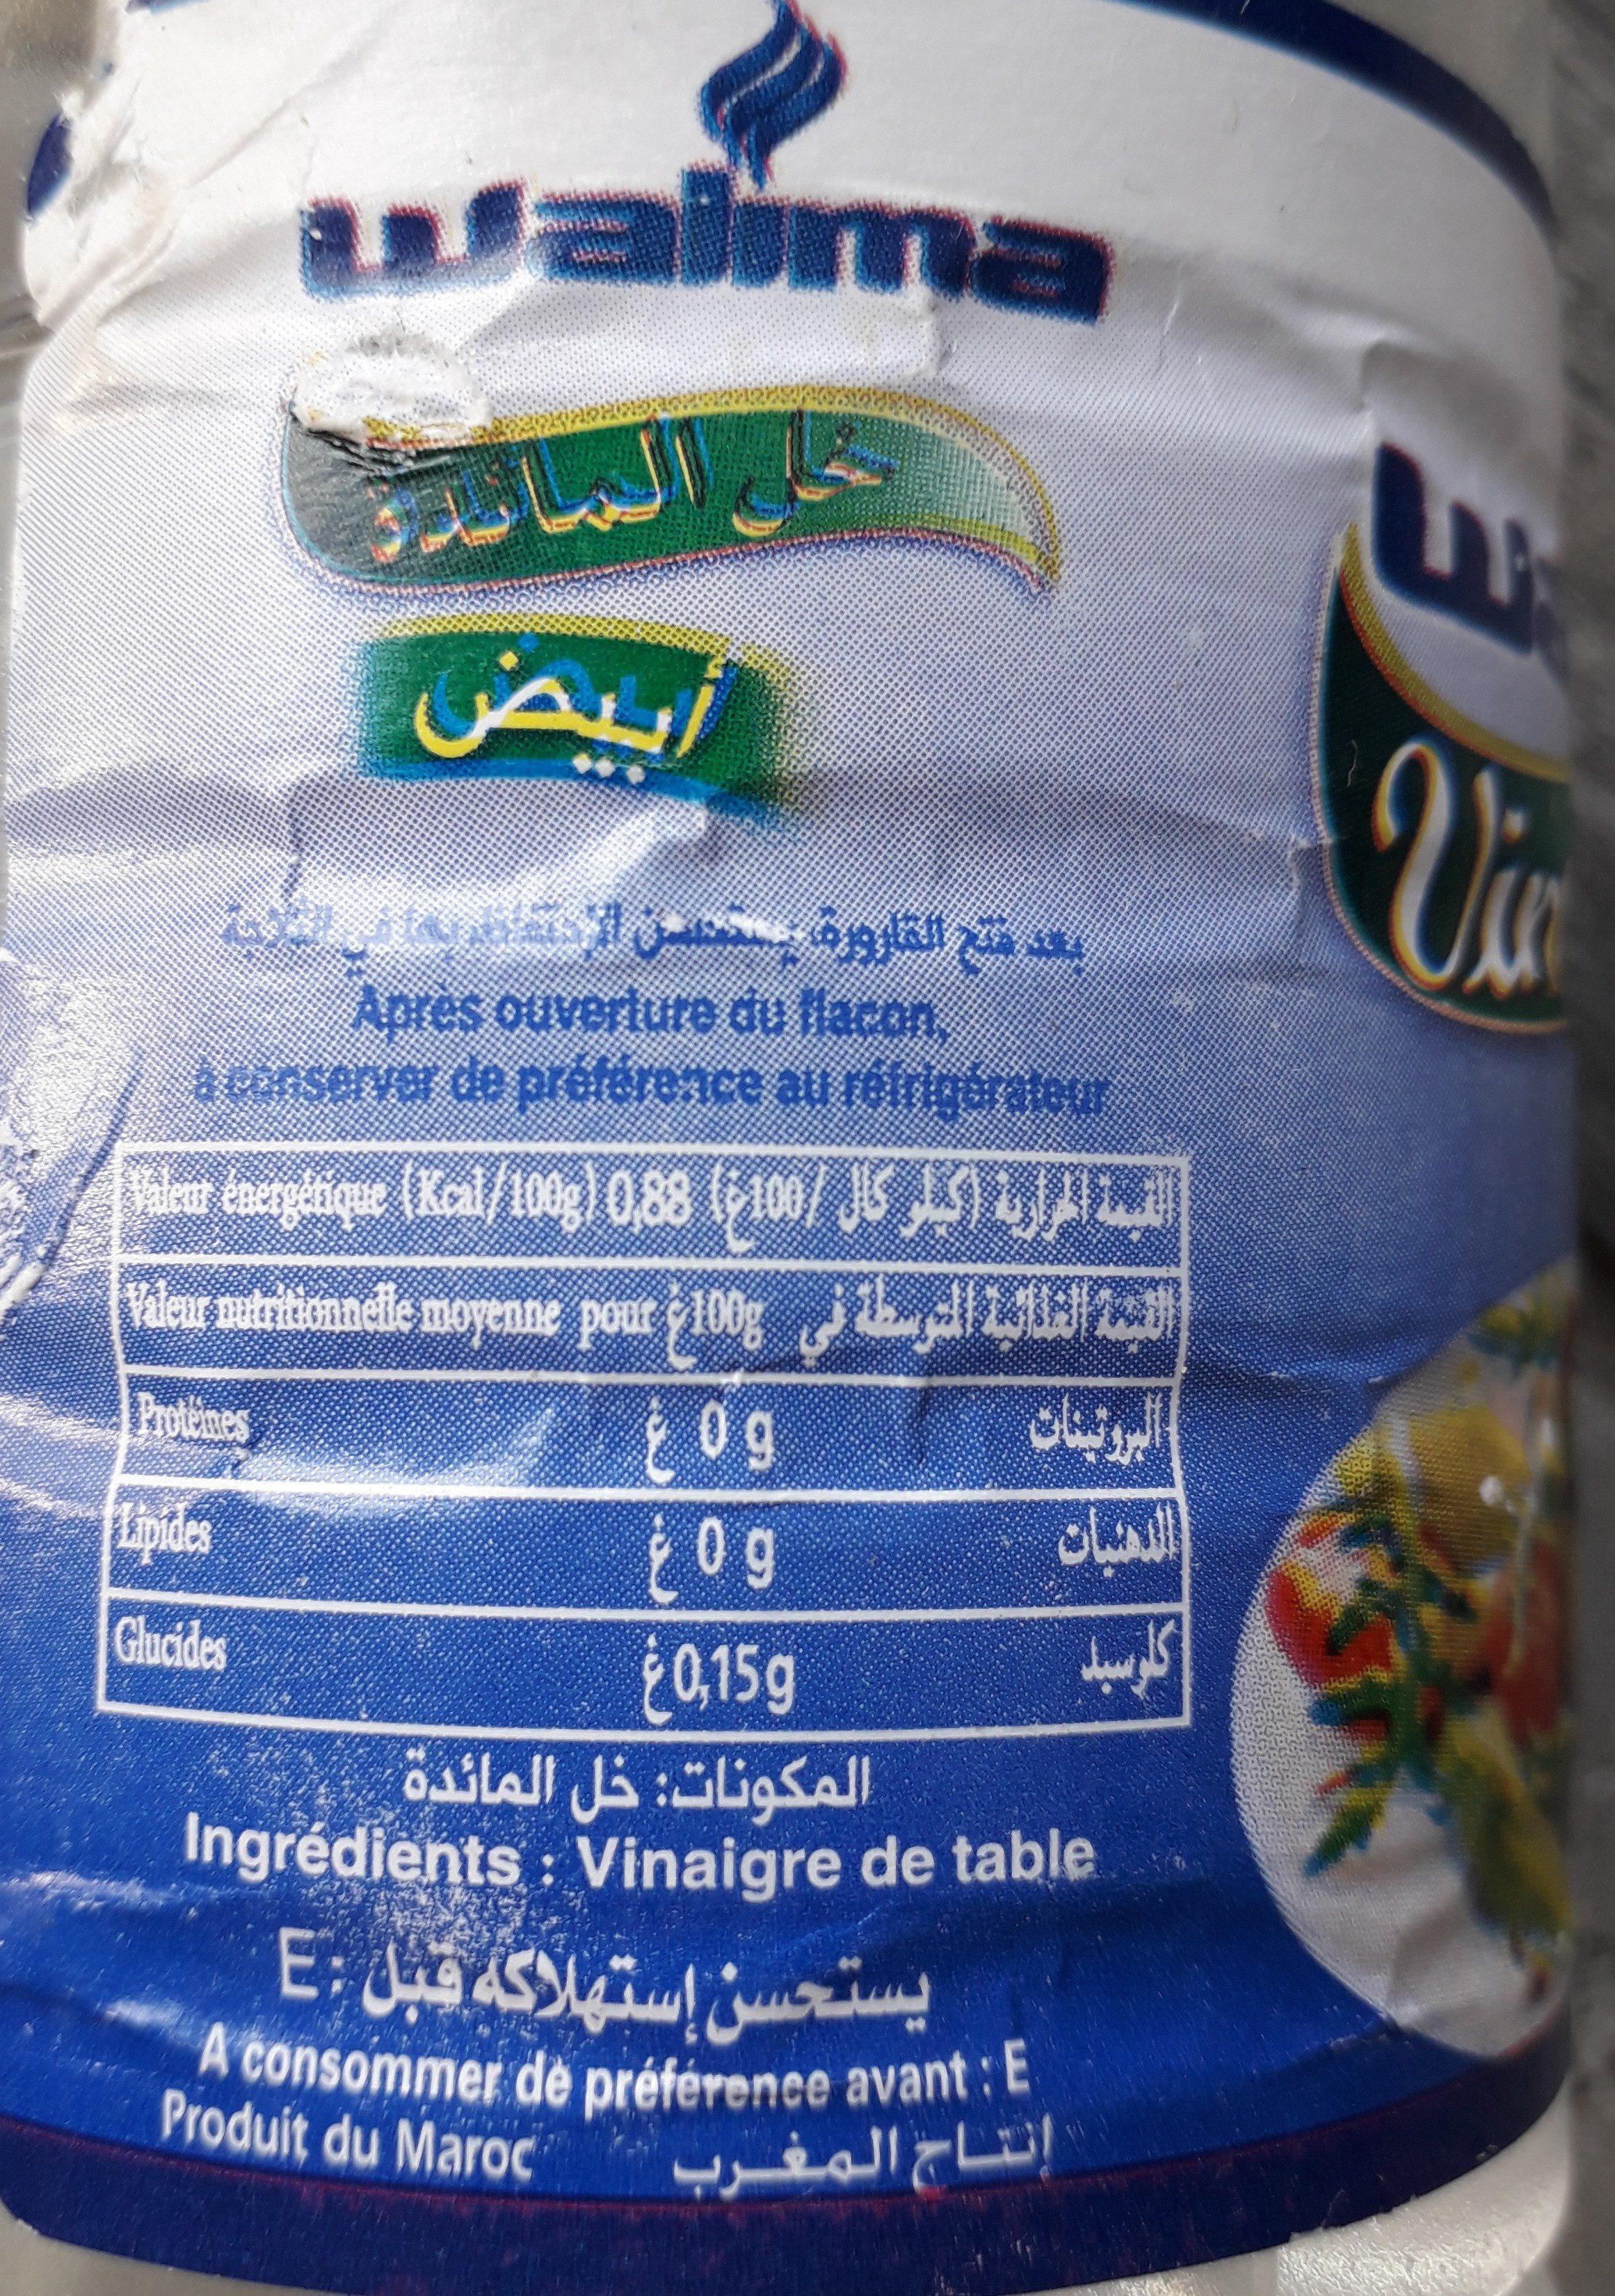 Vinaigre de table 6 - Ingredients